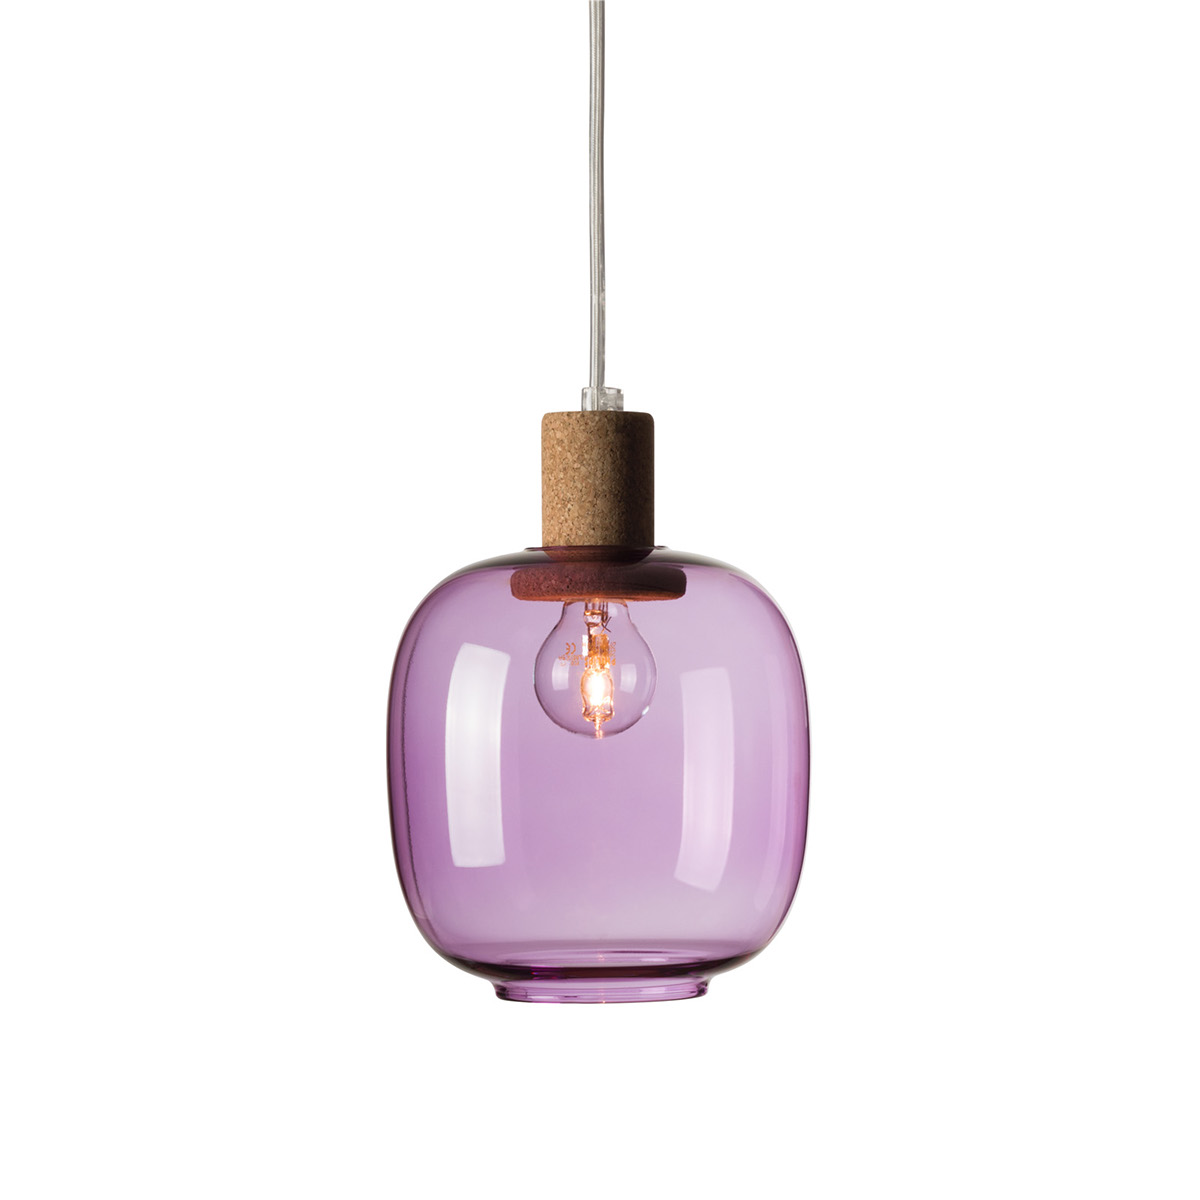 Picia-pendant-lamp-hisheji (4)